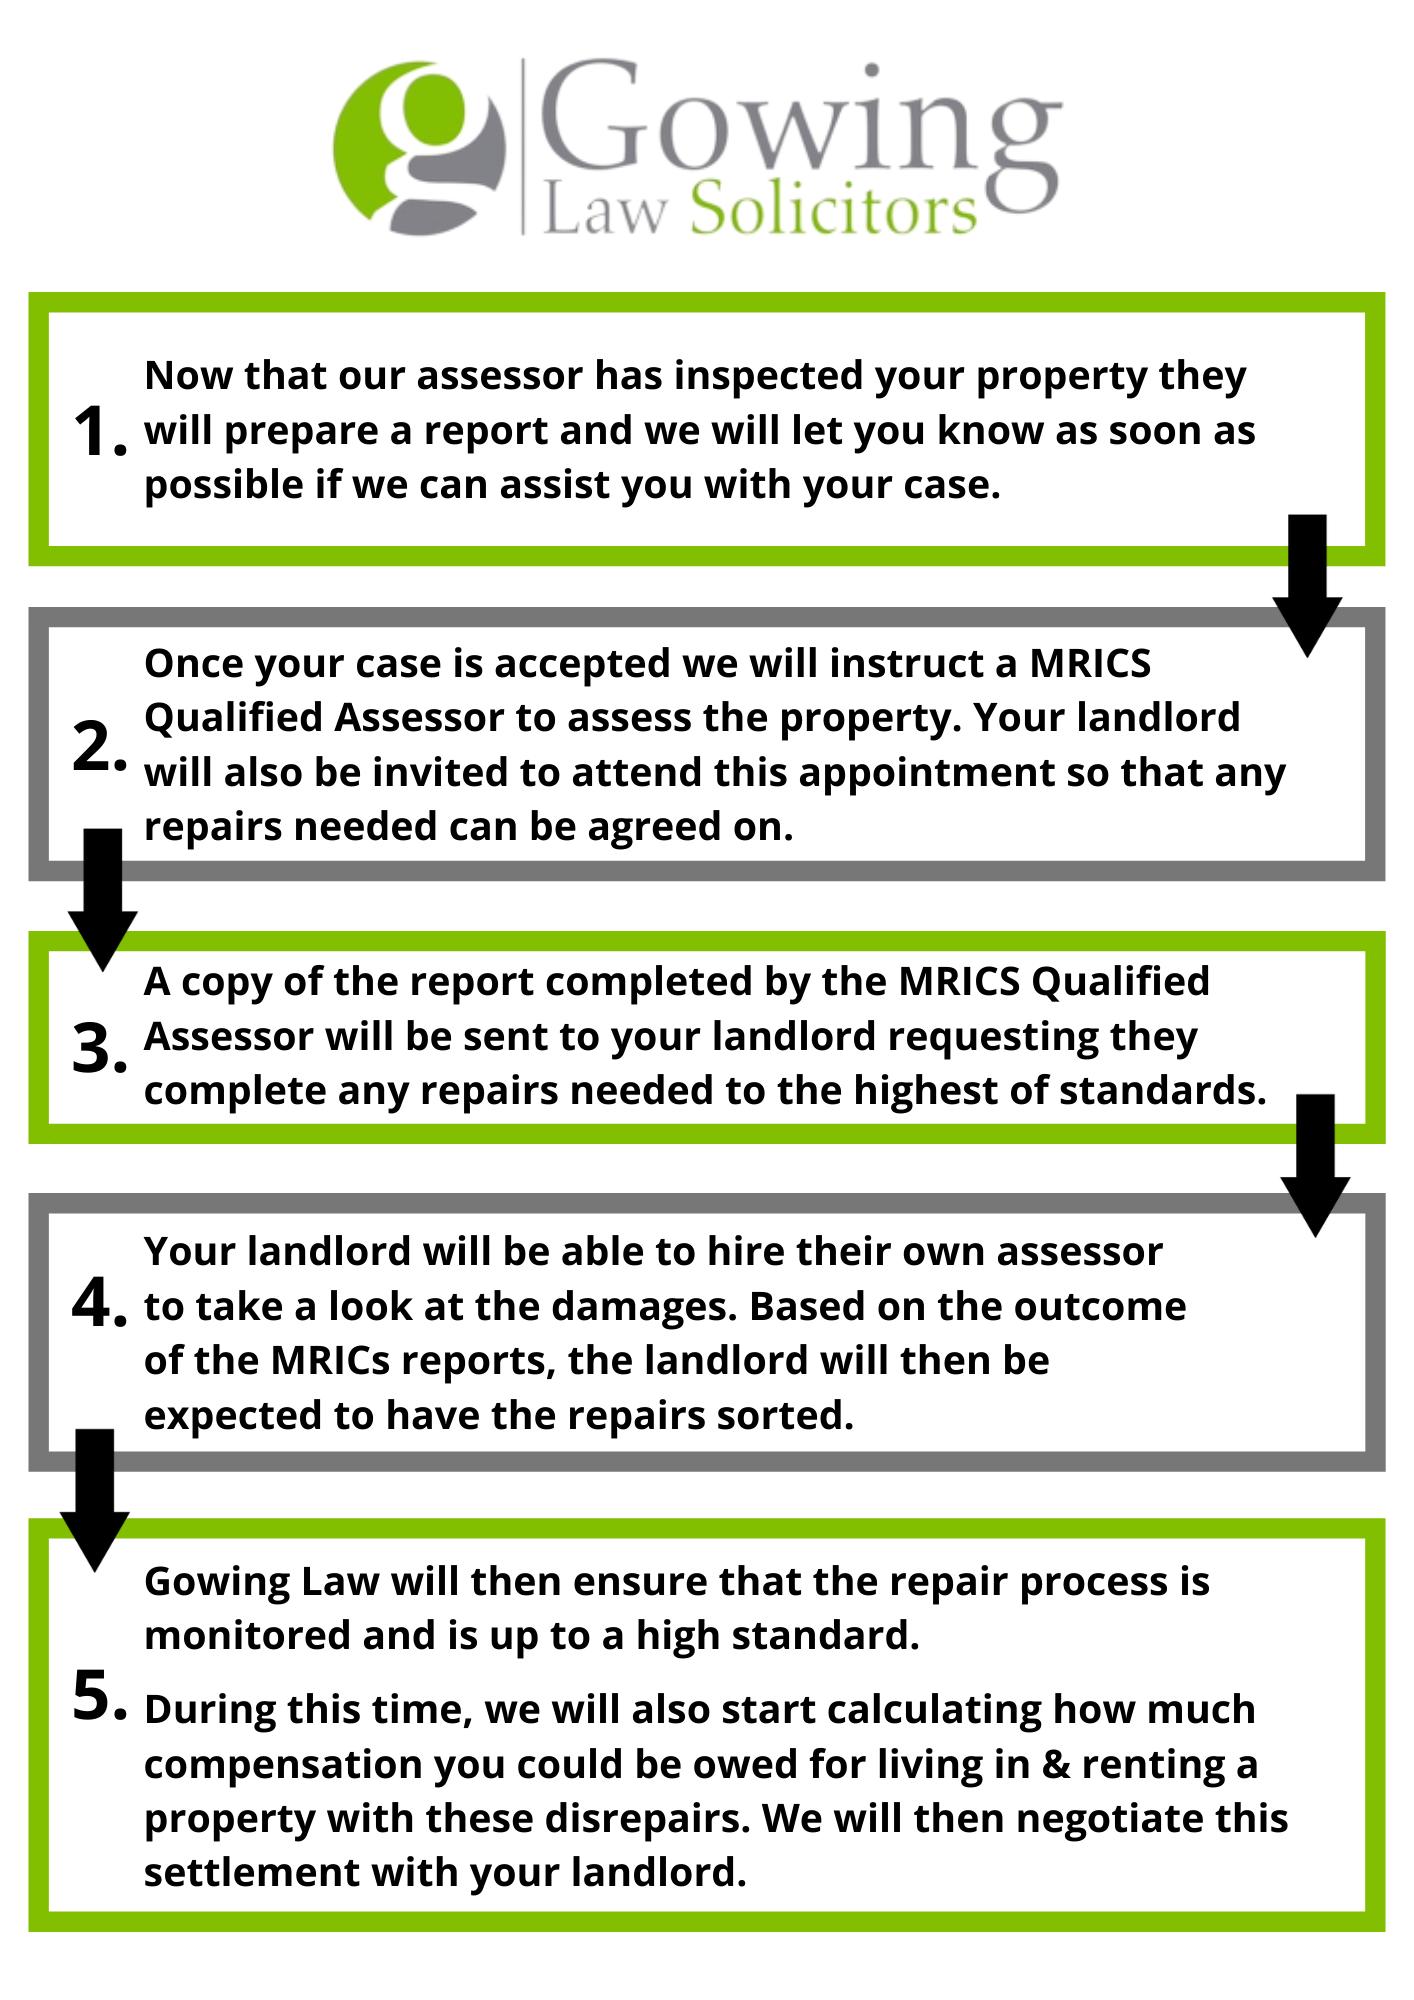 Assessor steps for a housing disrepair claim